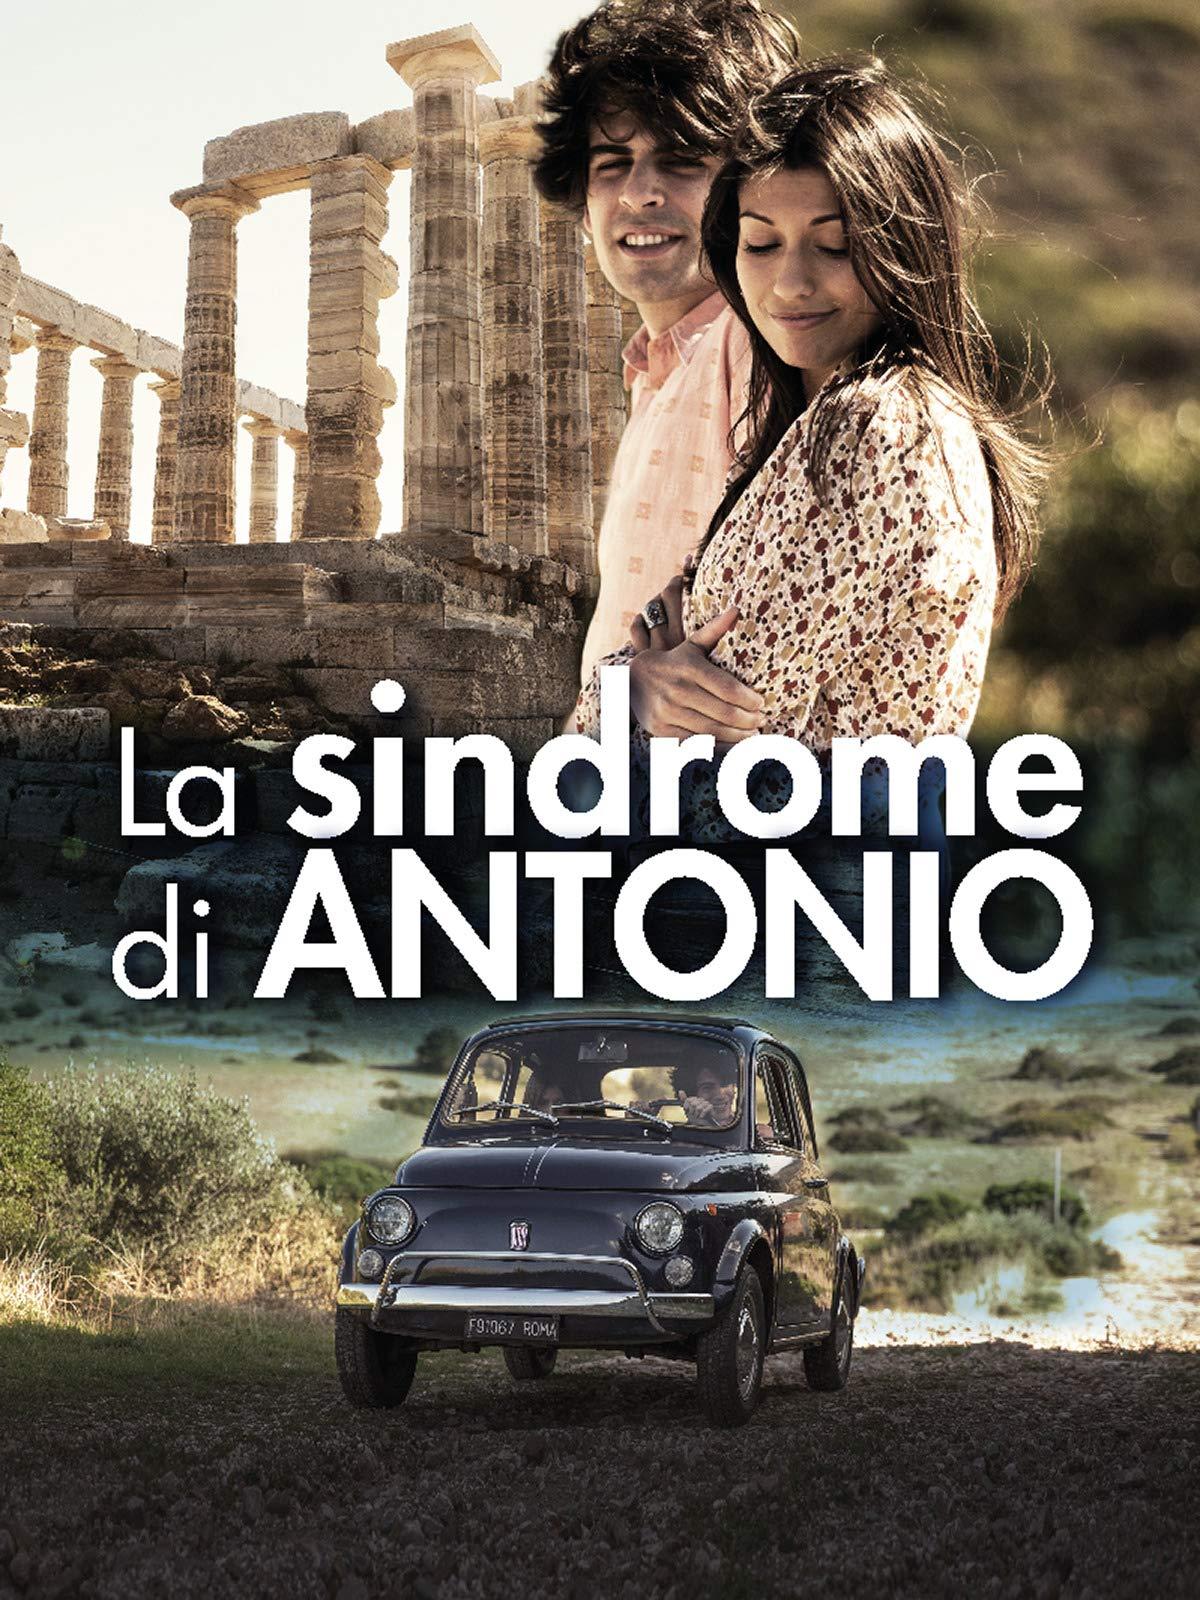 Antonio's Syndrome (La Sindrome di Antonio)